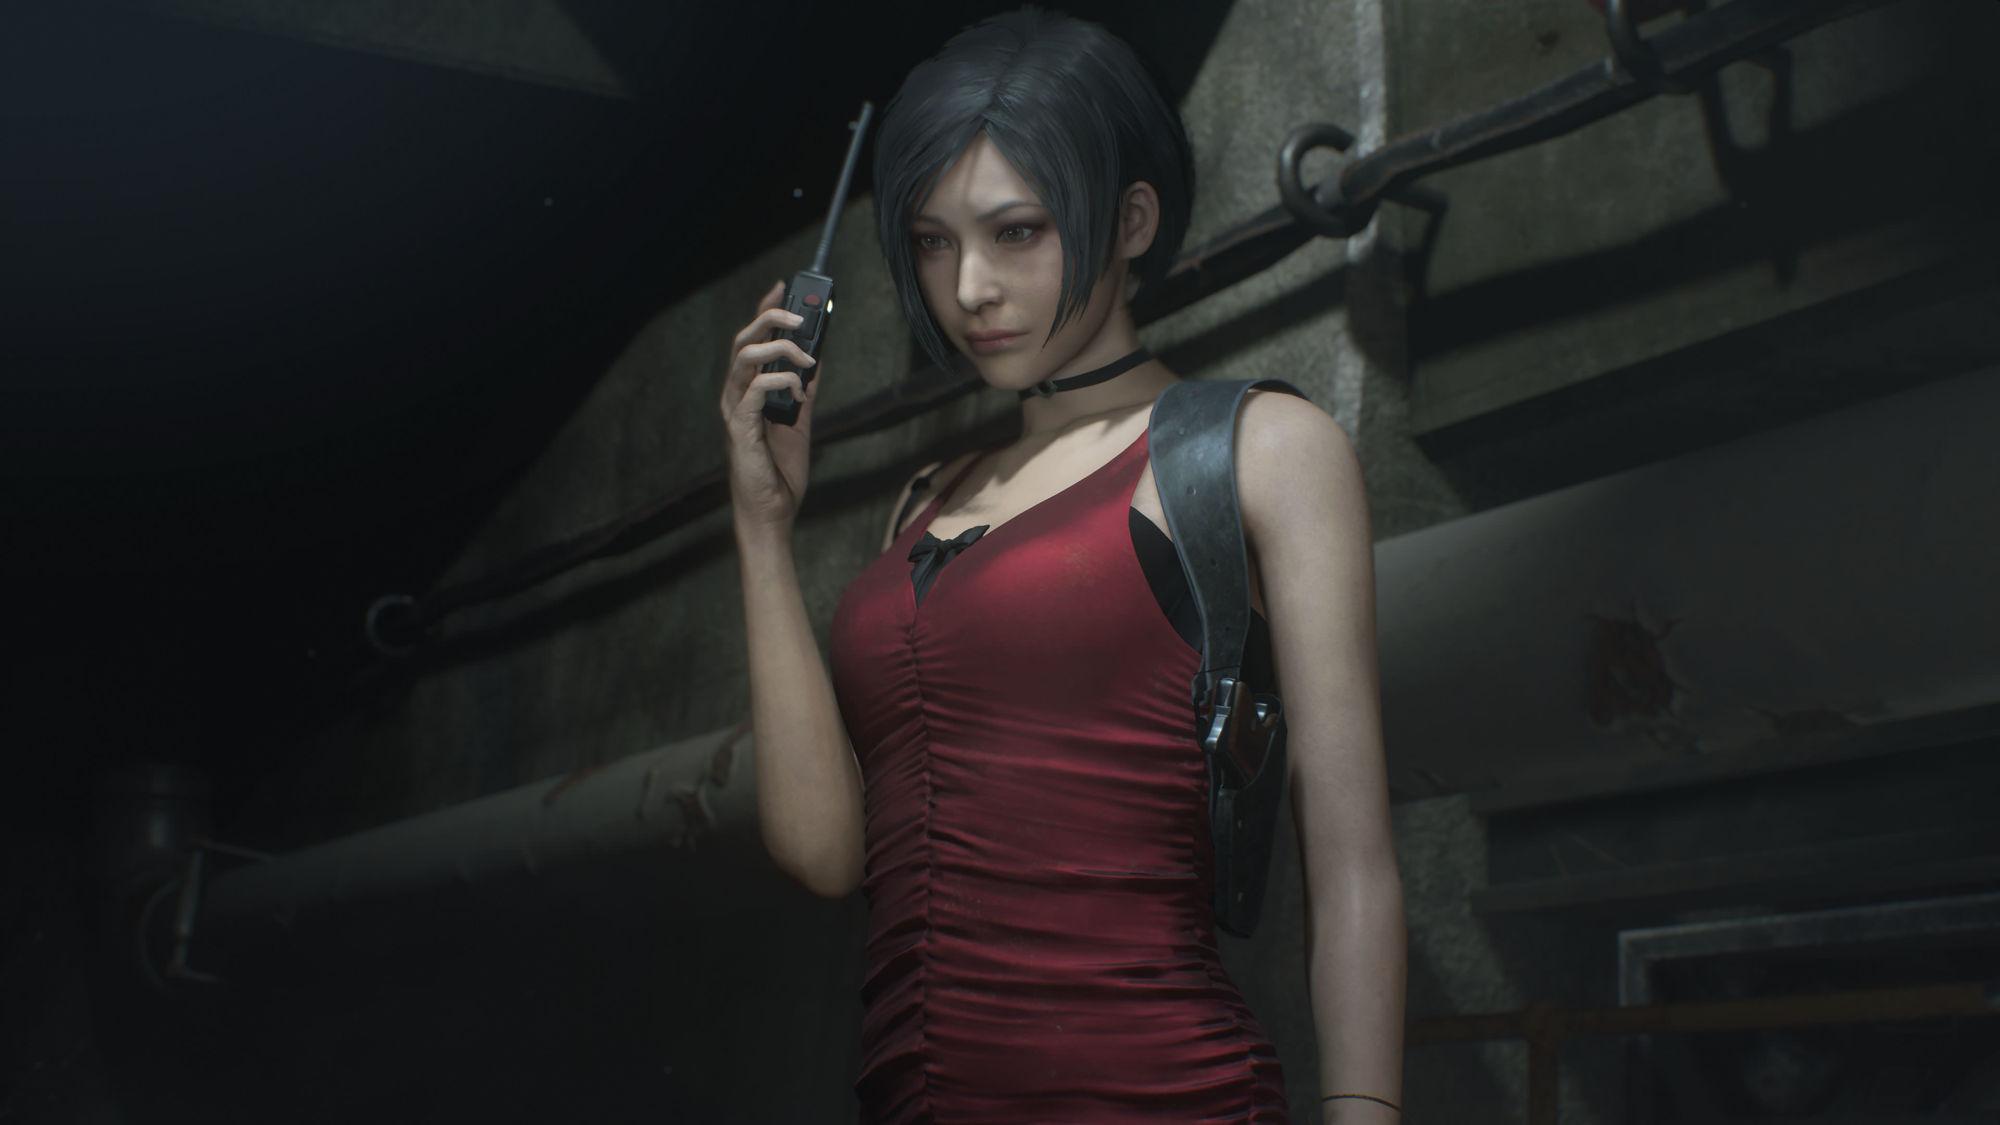 Pubg Resident Evil 2 Wallpaper Download Wallpaper Game Hd